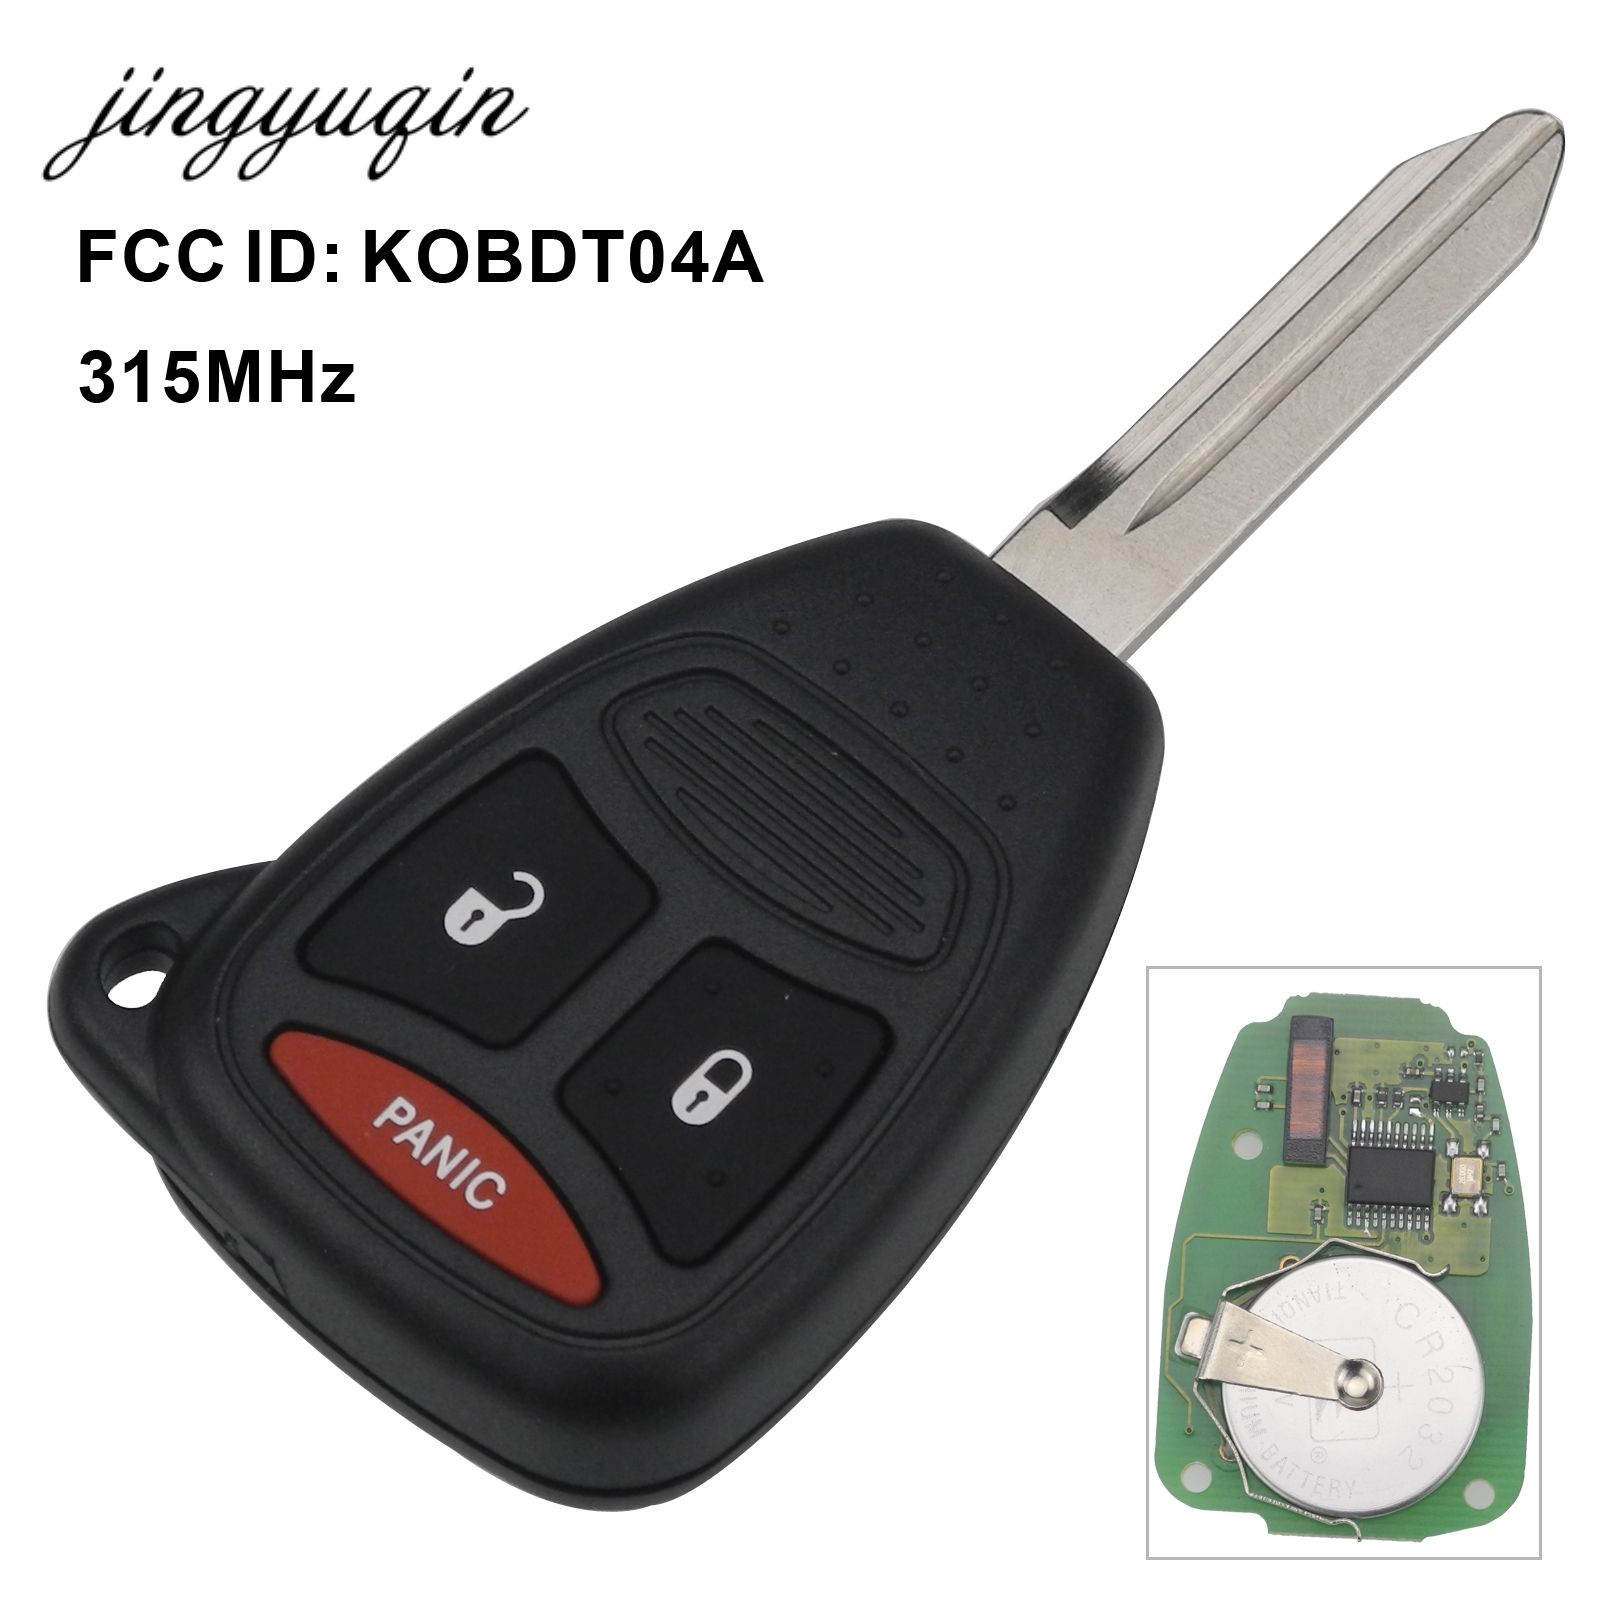 jingyuqin 3 Button Remote key Fob Control KOBDT04A 315MHz for Dodge Dakota Durango Charger for Jeep Grand Cherokee Chrysler 300 dodge dakota durango 17x9 5 double spokes factory oem wheel rim silver remanufactured